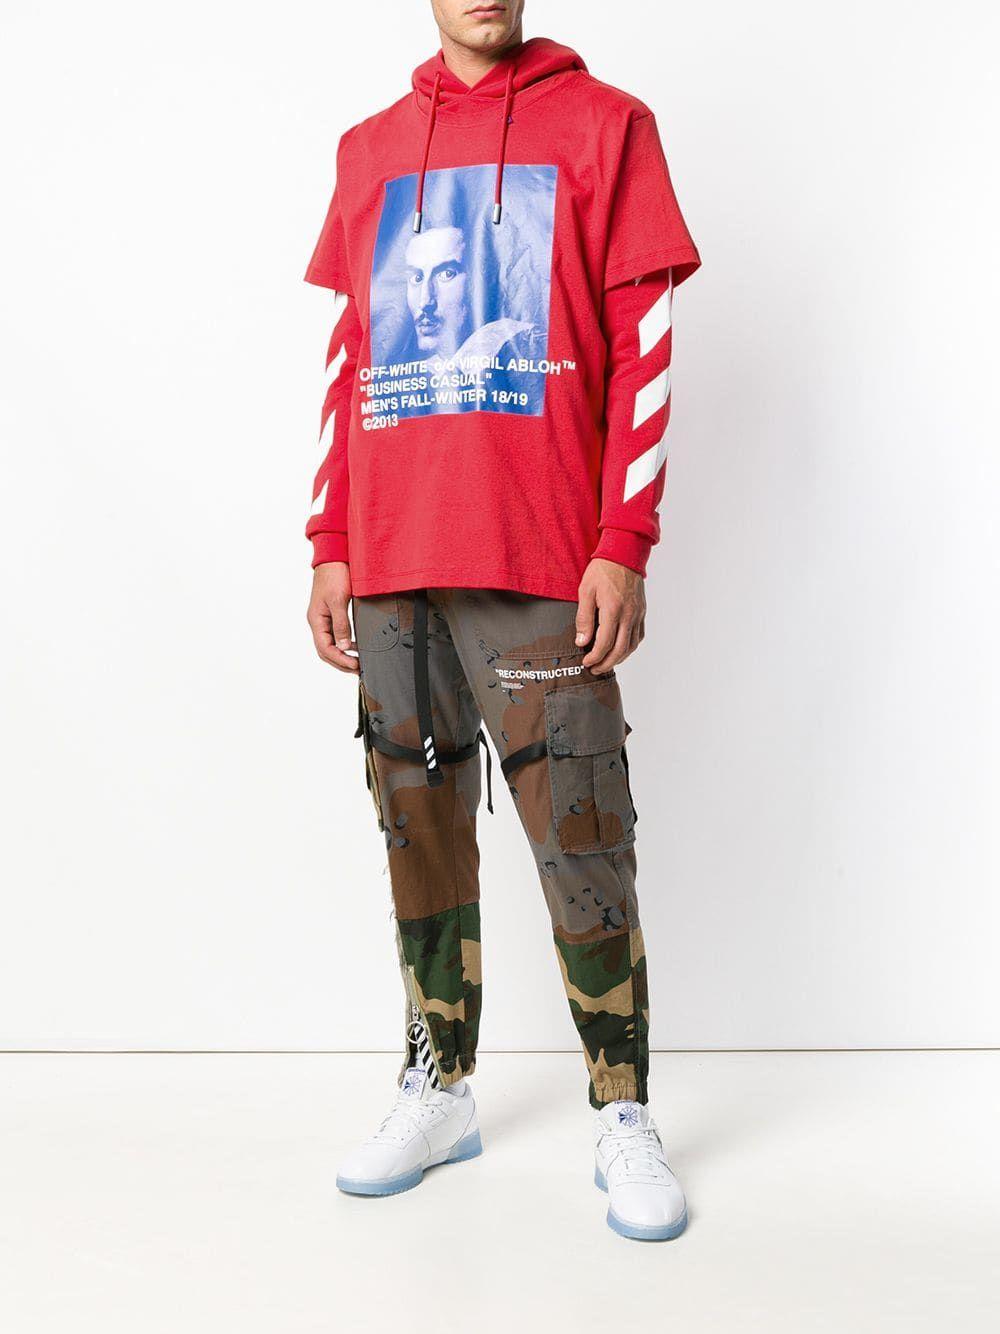 OffWhite layered printed hoodie Hoodies, Off white, Shirts